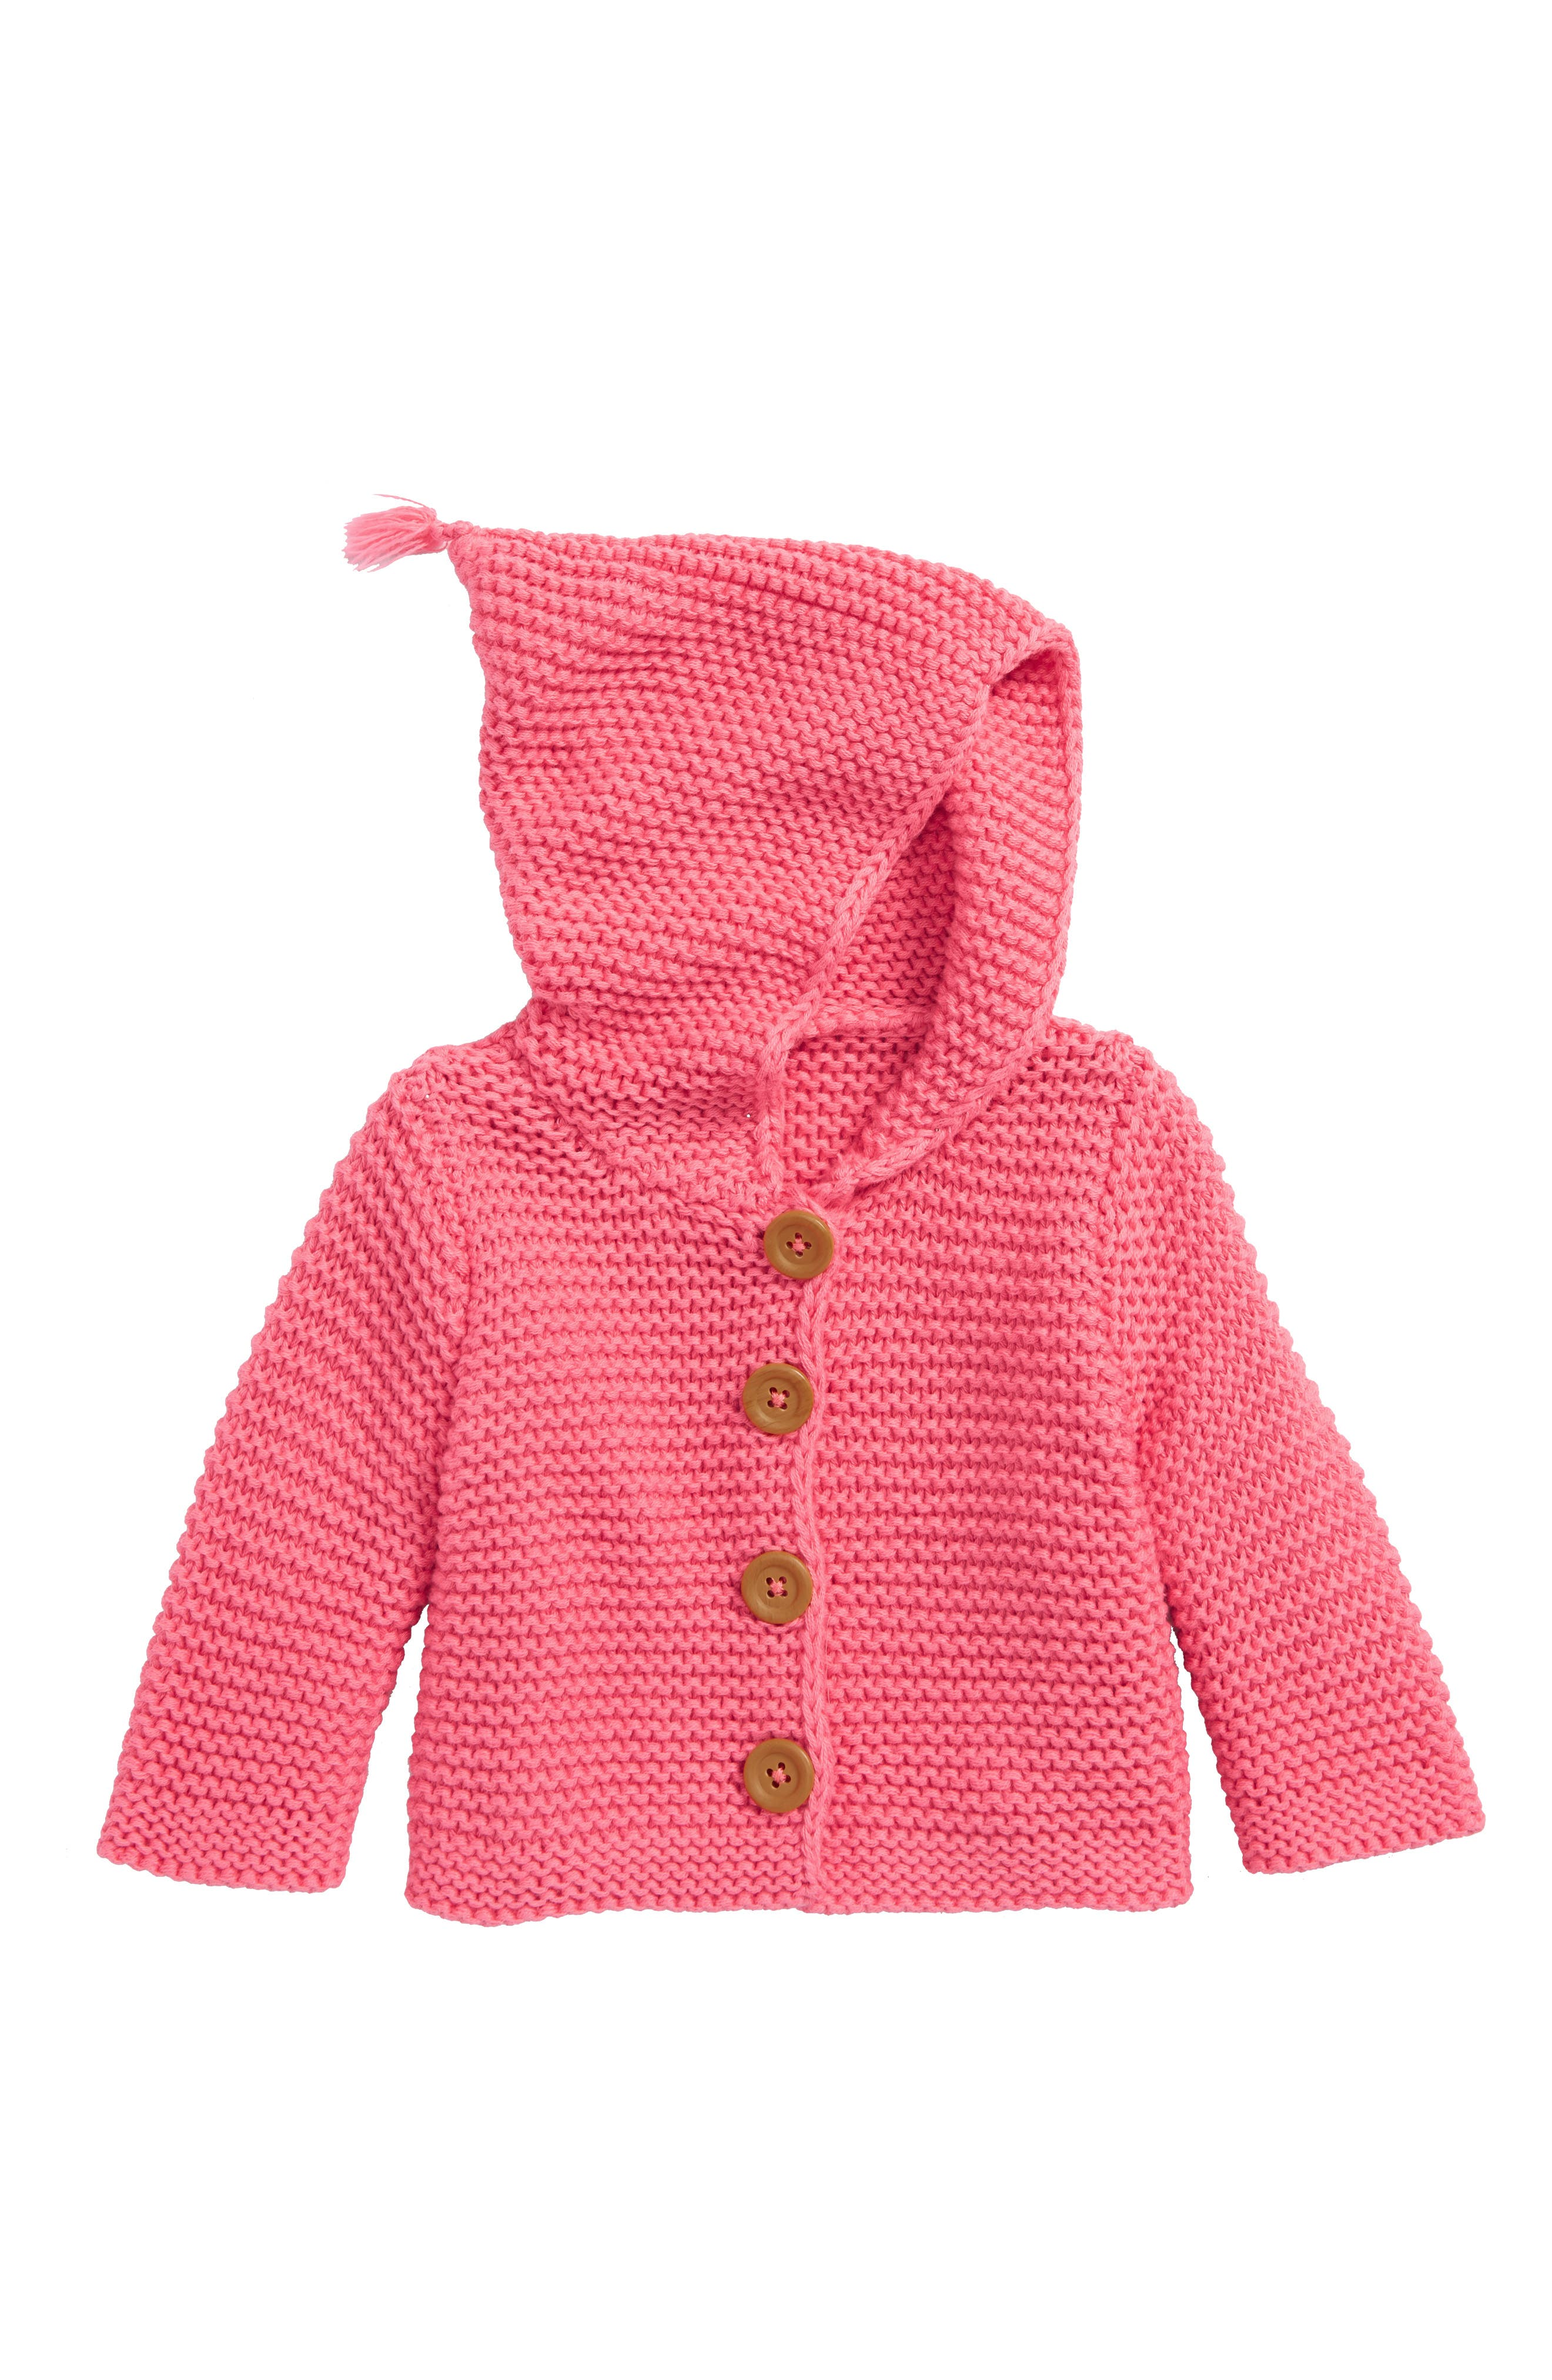 Lofty Organic Cotton Hooded Cardigan,                         Main,                         color, Pink Lemonade